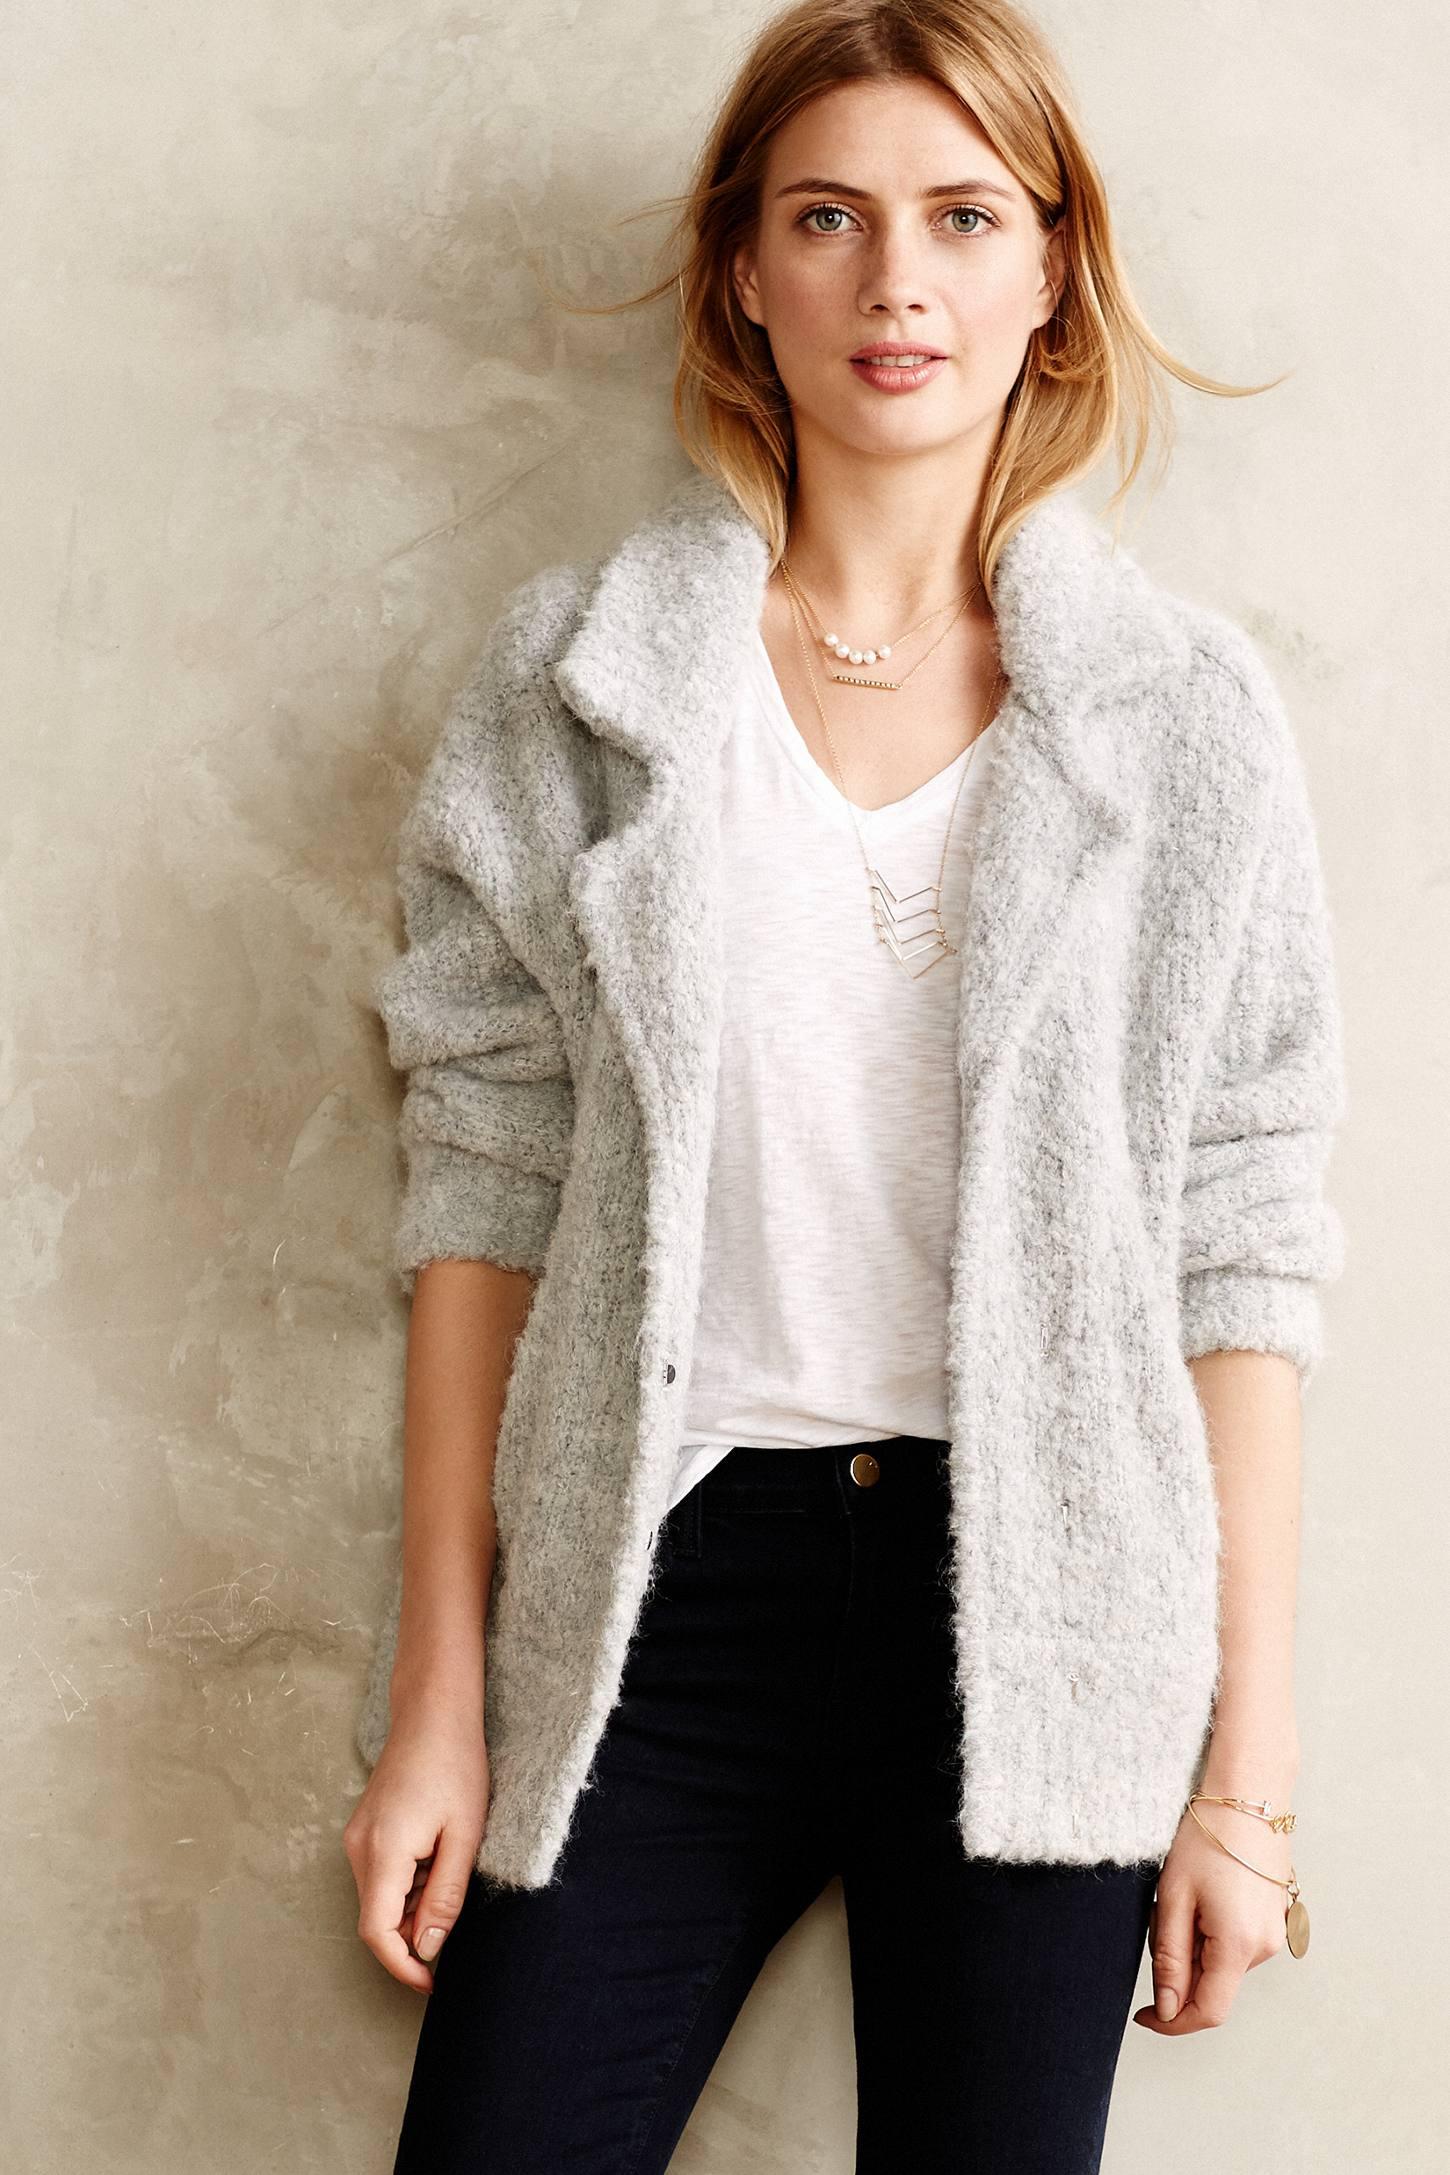 Boucle Sweater Coat Fashion Women S Coat 2017